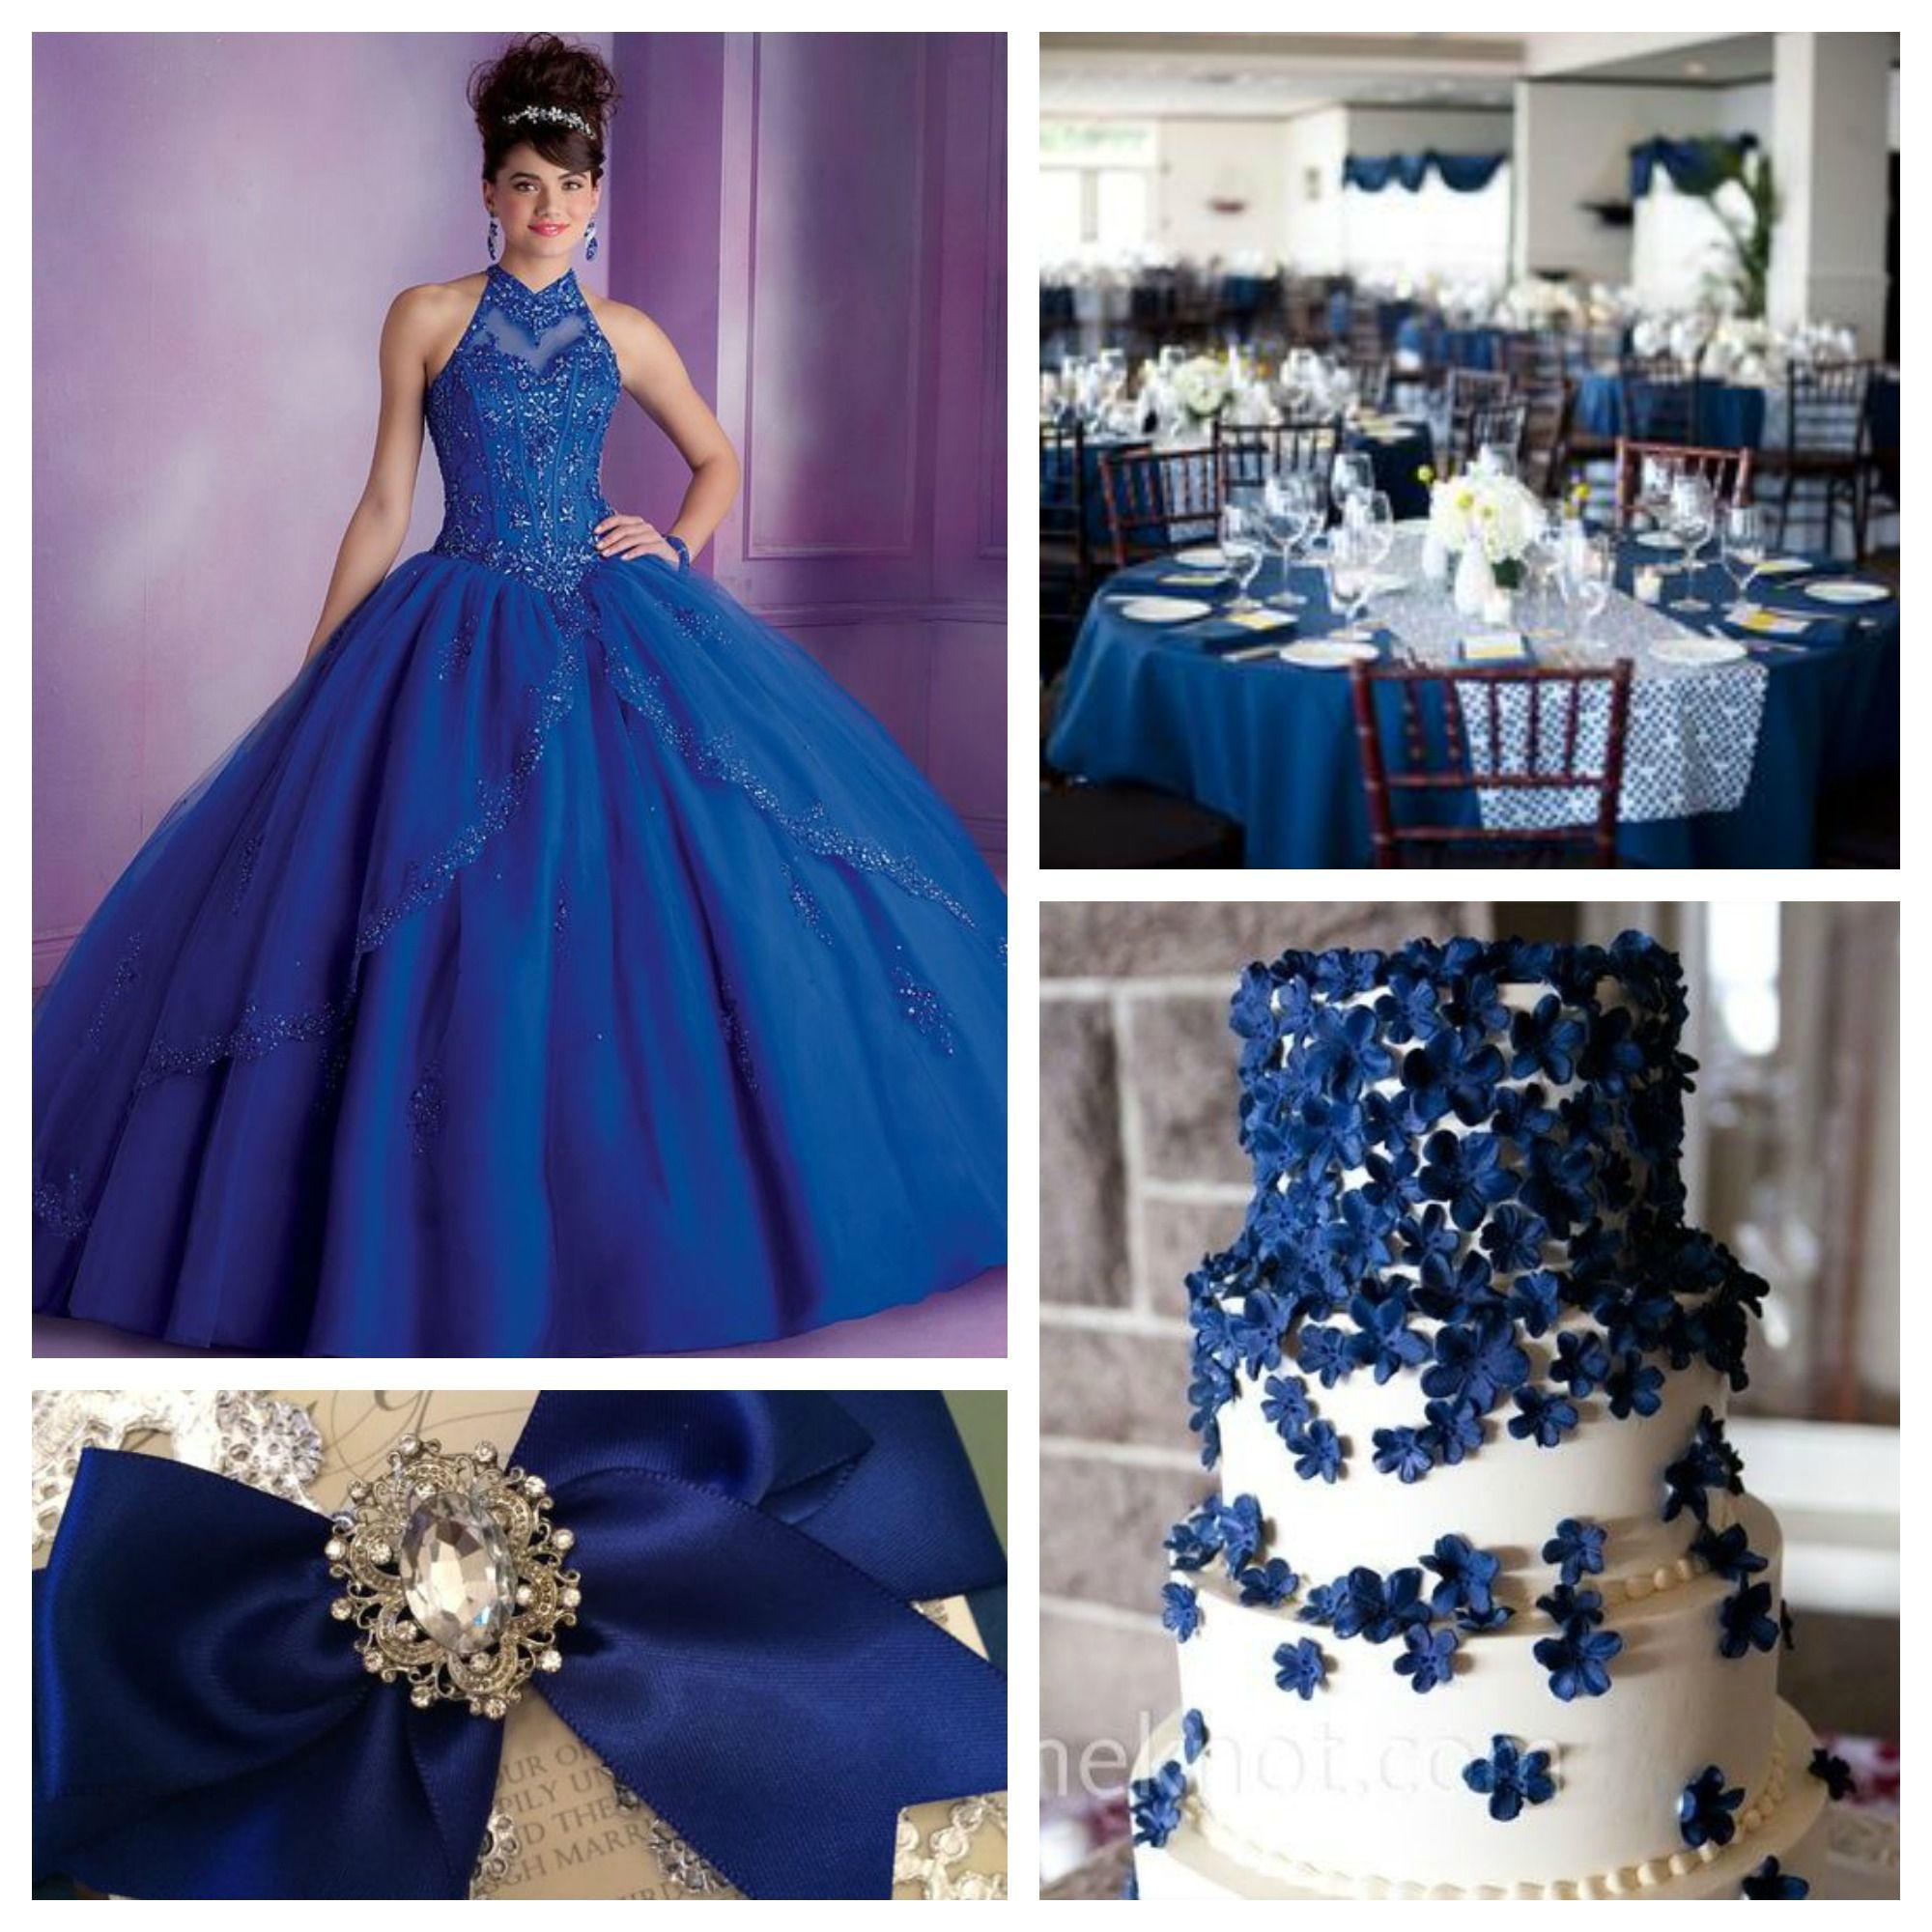 Quince Theme Decorations | Quinceanera dresses blue, Quinceanera themes, Quince themes